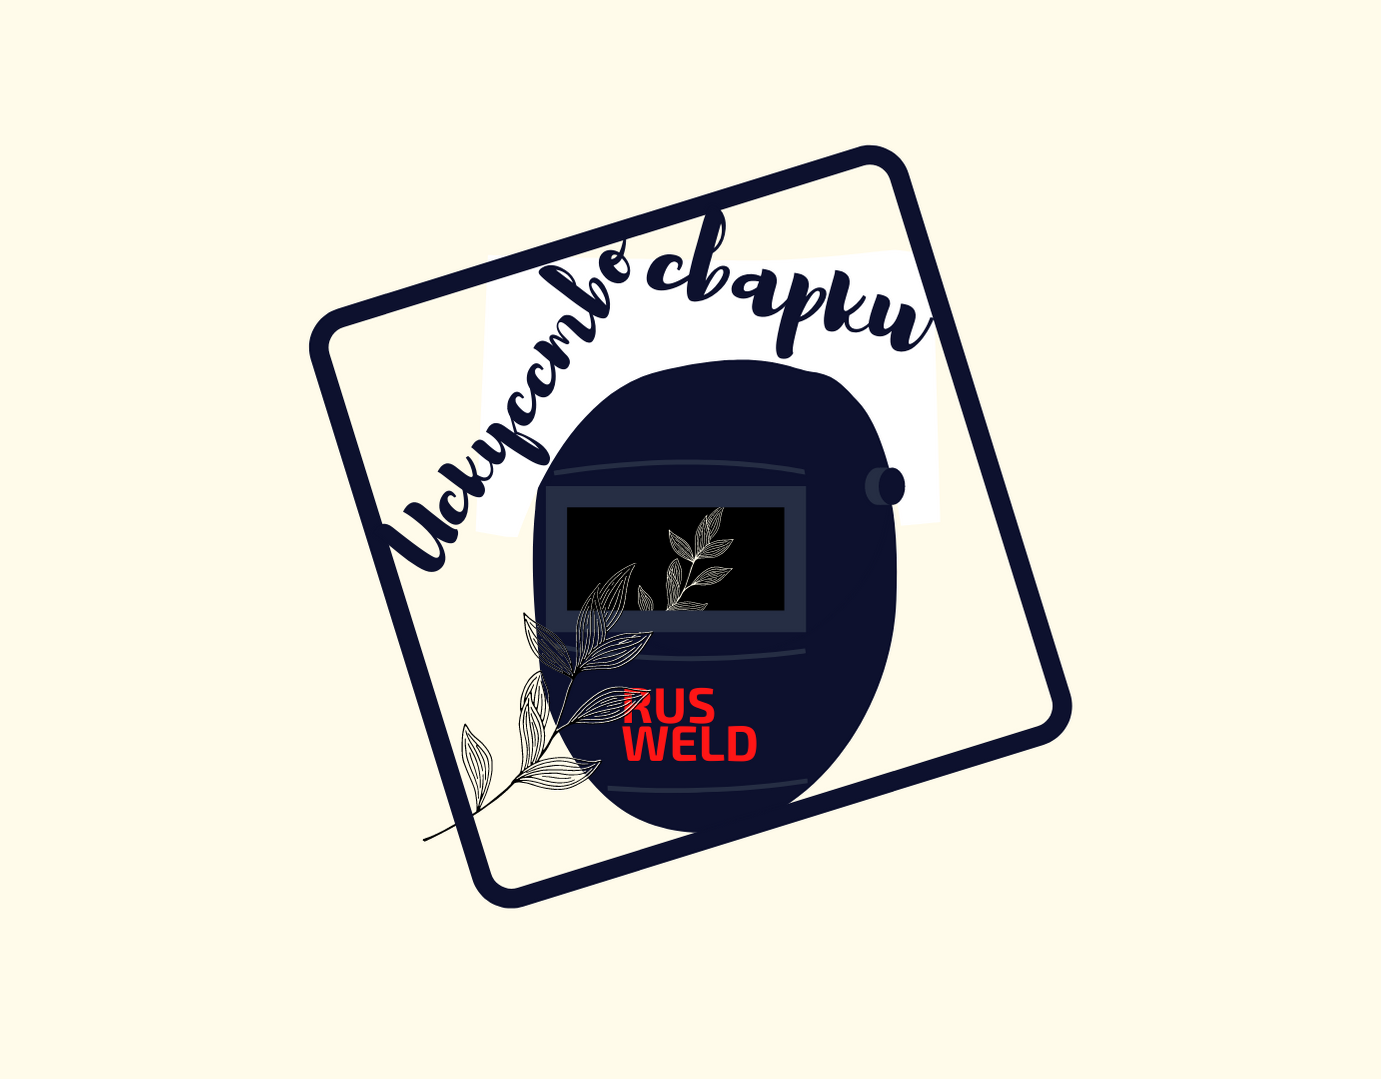 Разработка логотипа для Конкурса фото f_5675f70fccfdf0c0.png